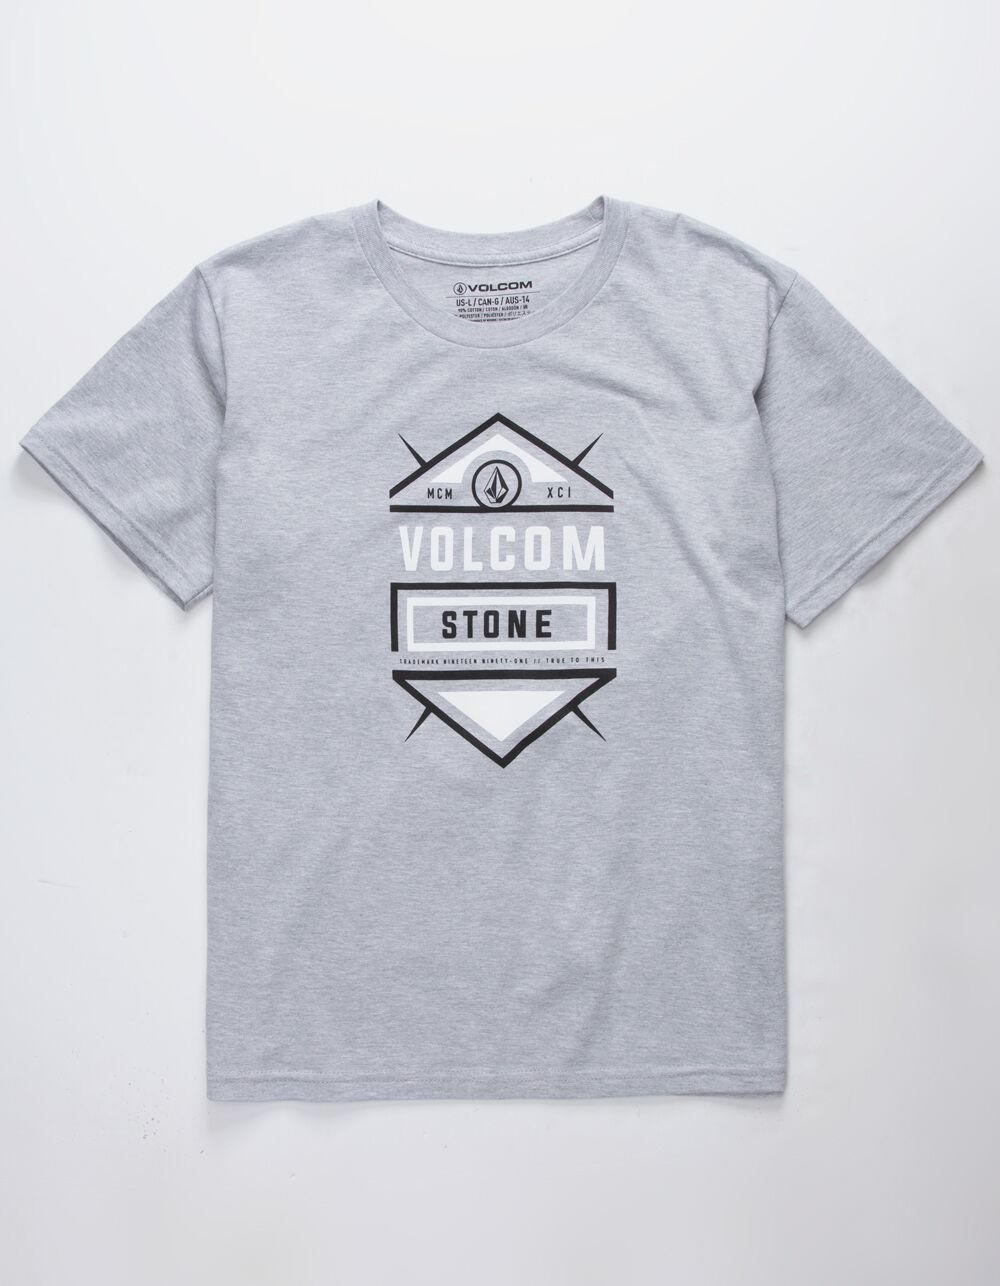 VOLCOM Bauble Boys T-Shirt